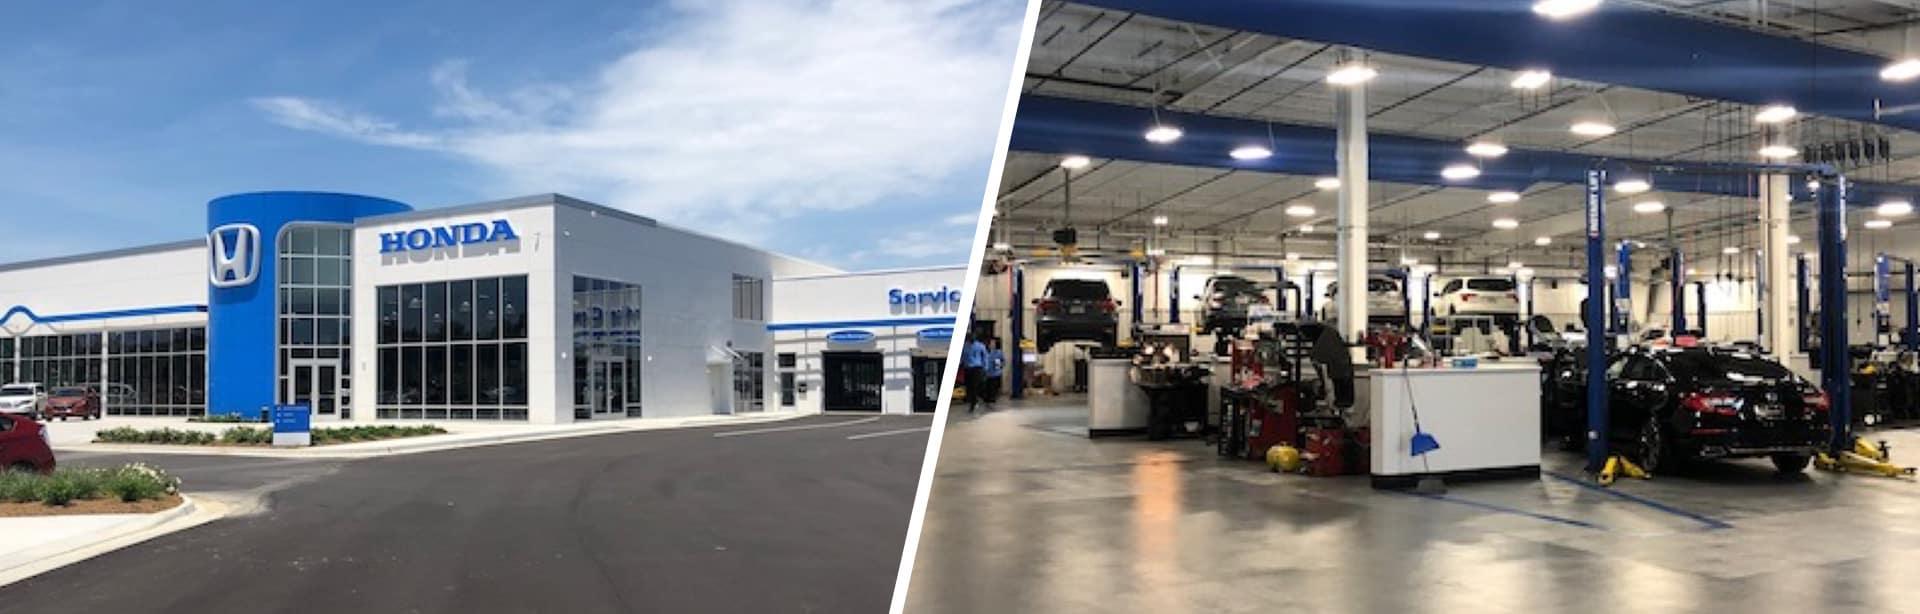 Richards Honda Parts & Service